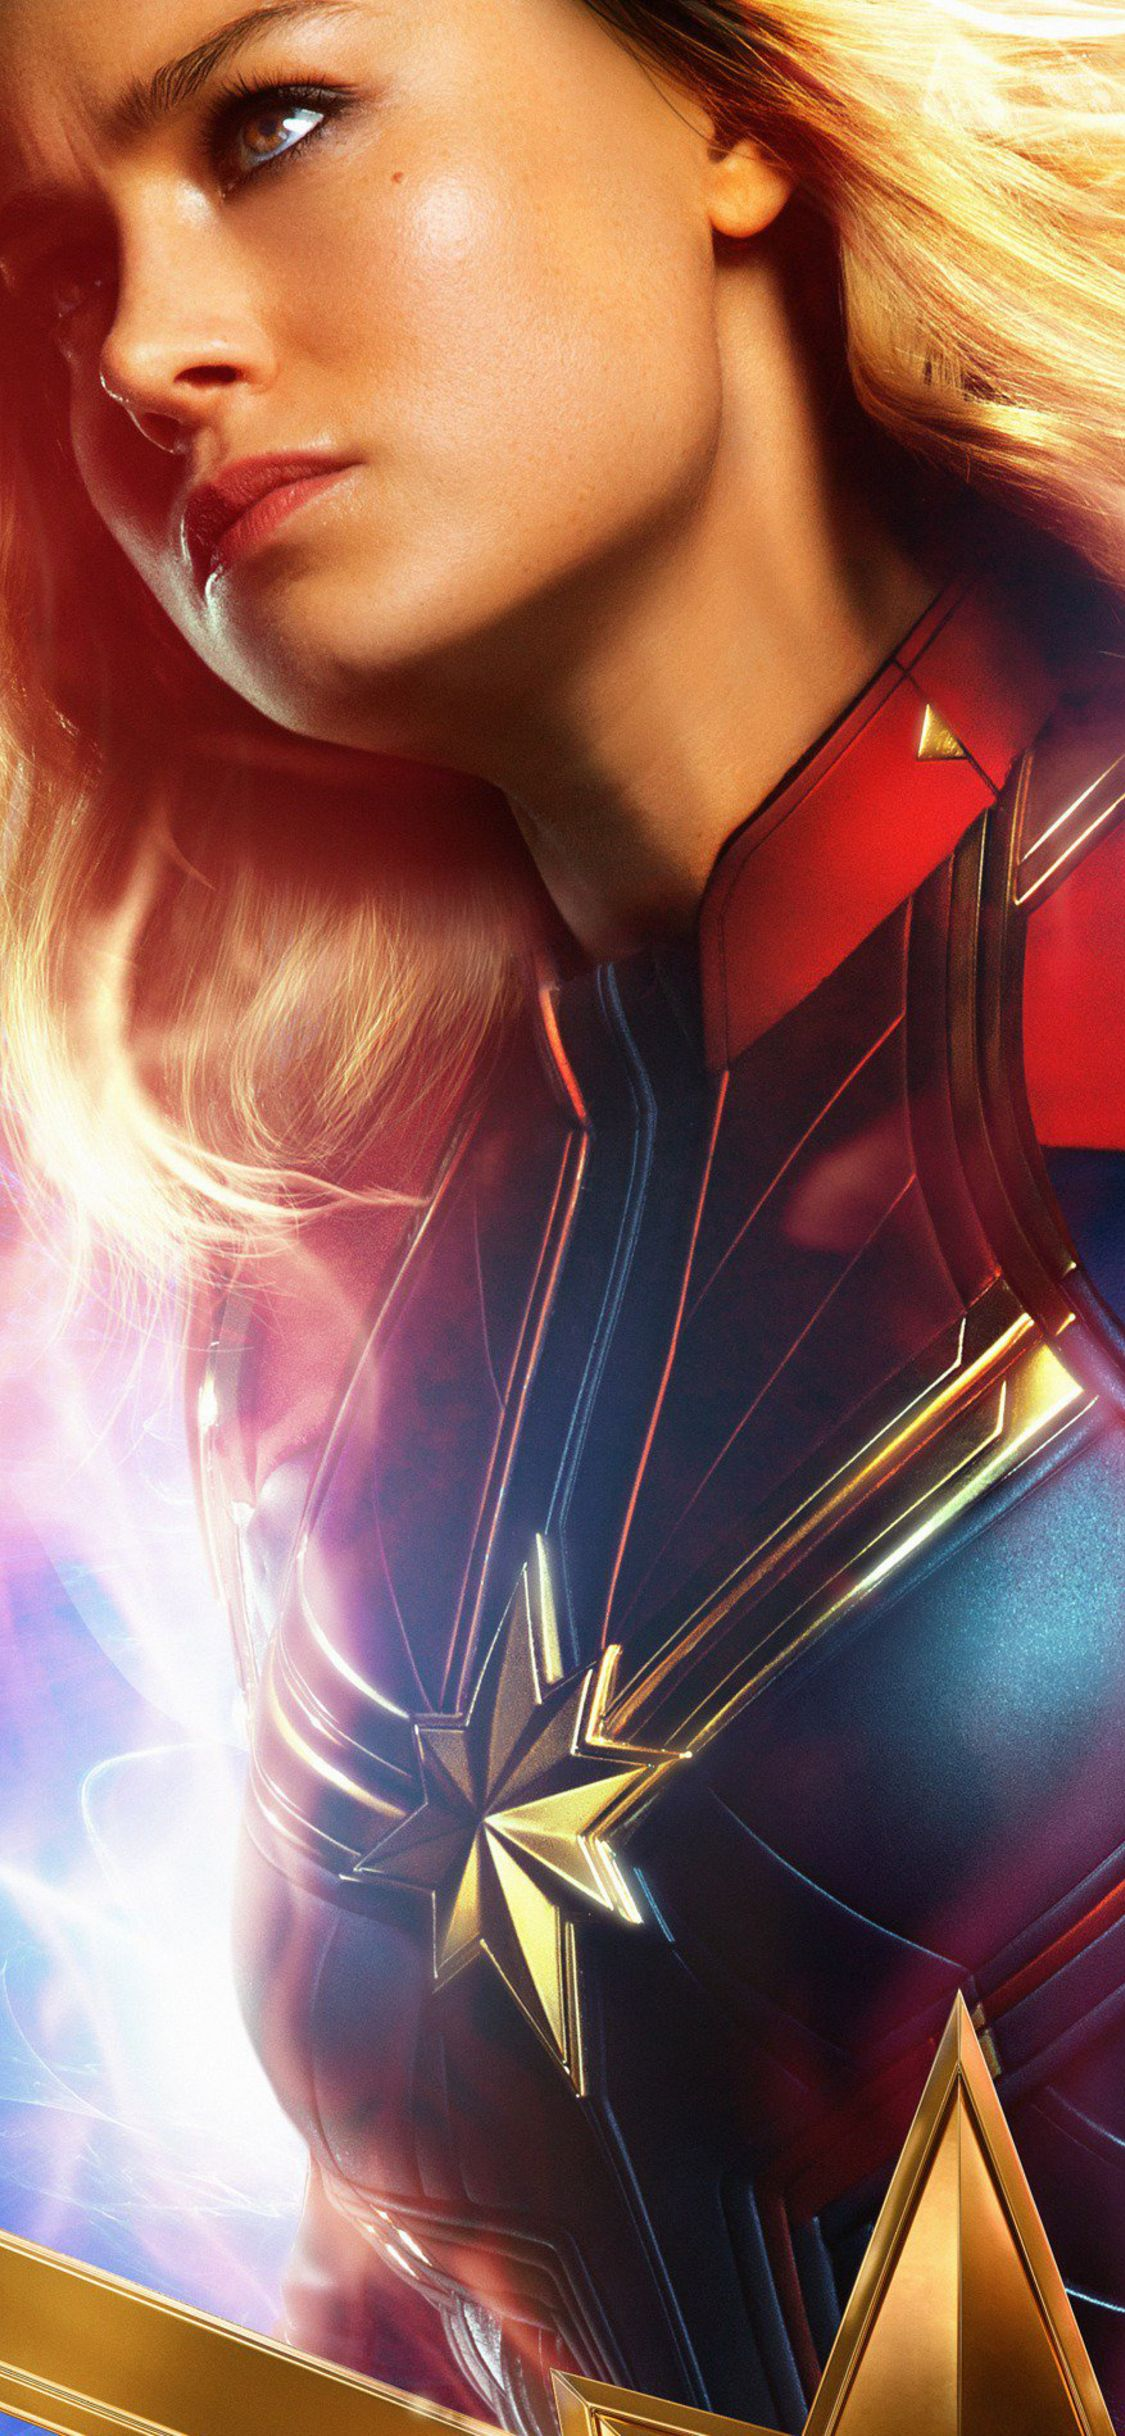 Brie Larson As Carol Danvers In Captain Marvel In 1125x2436 Resolution Captain Marvel Marvel Comics Wallpaper Brie Larson